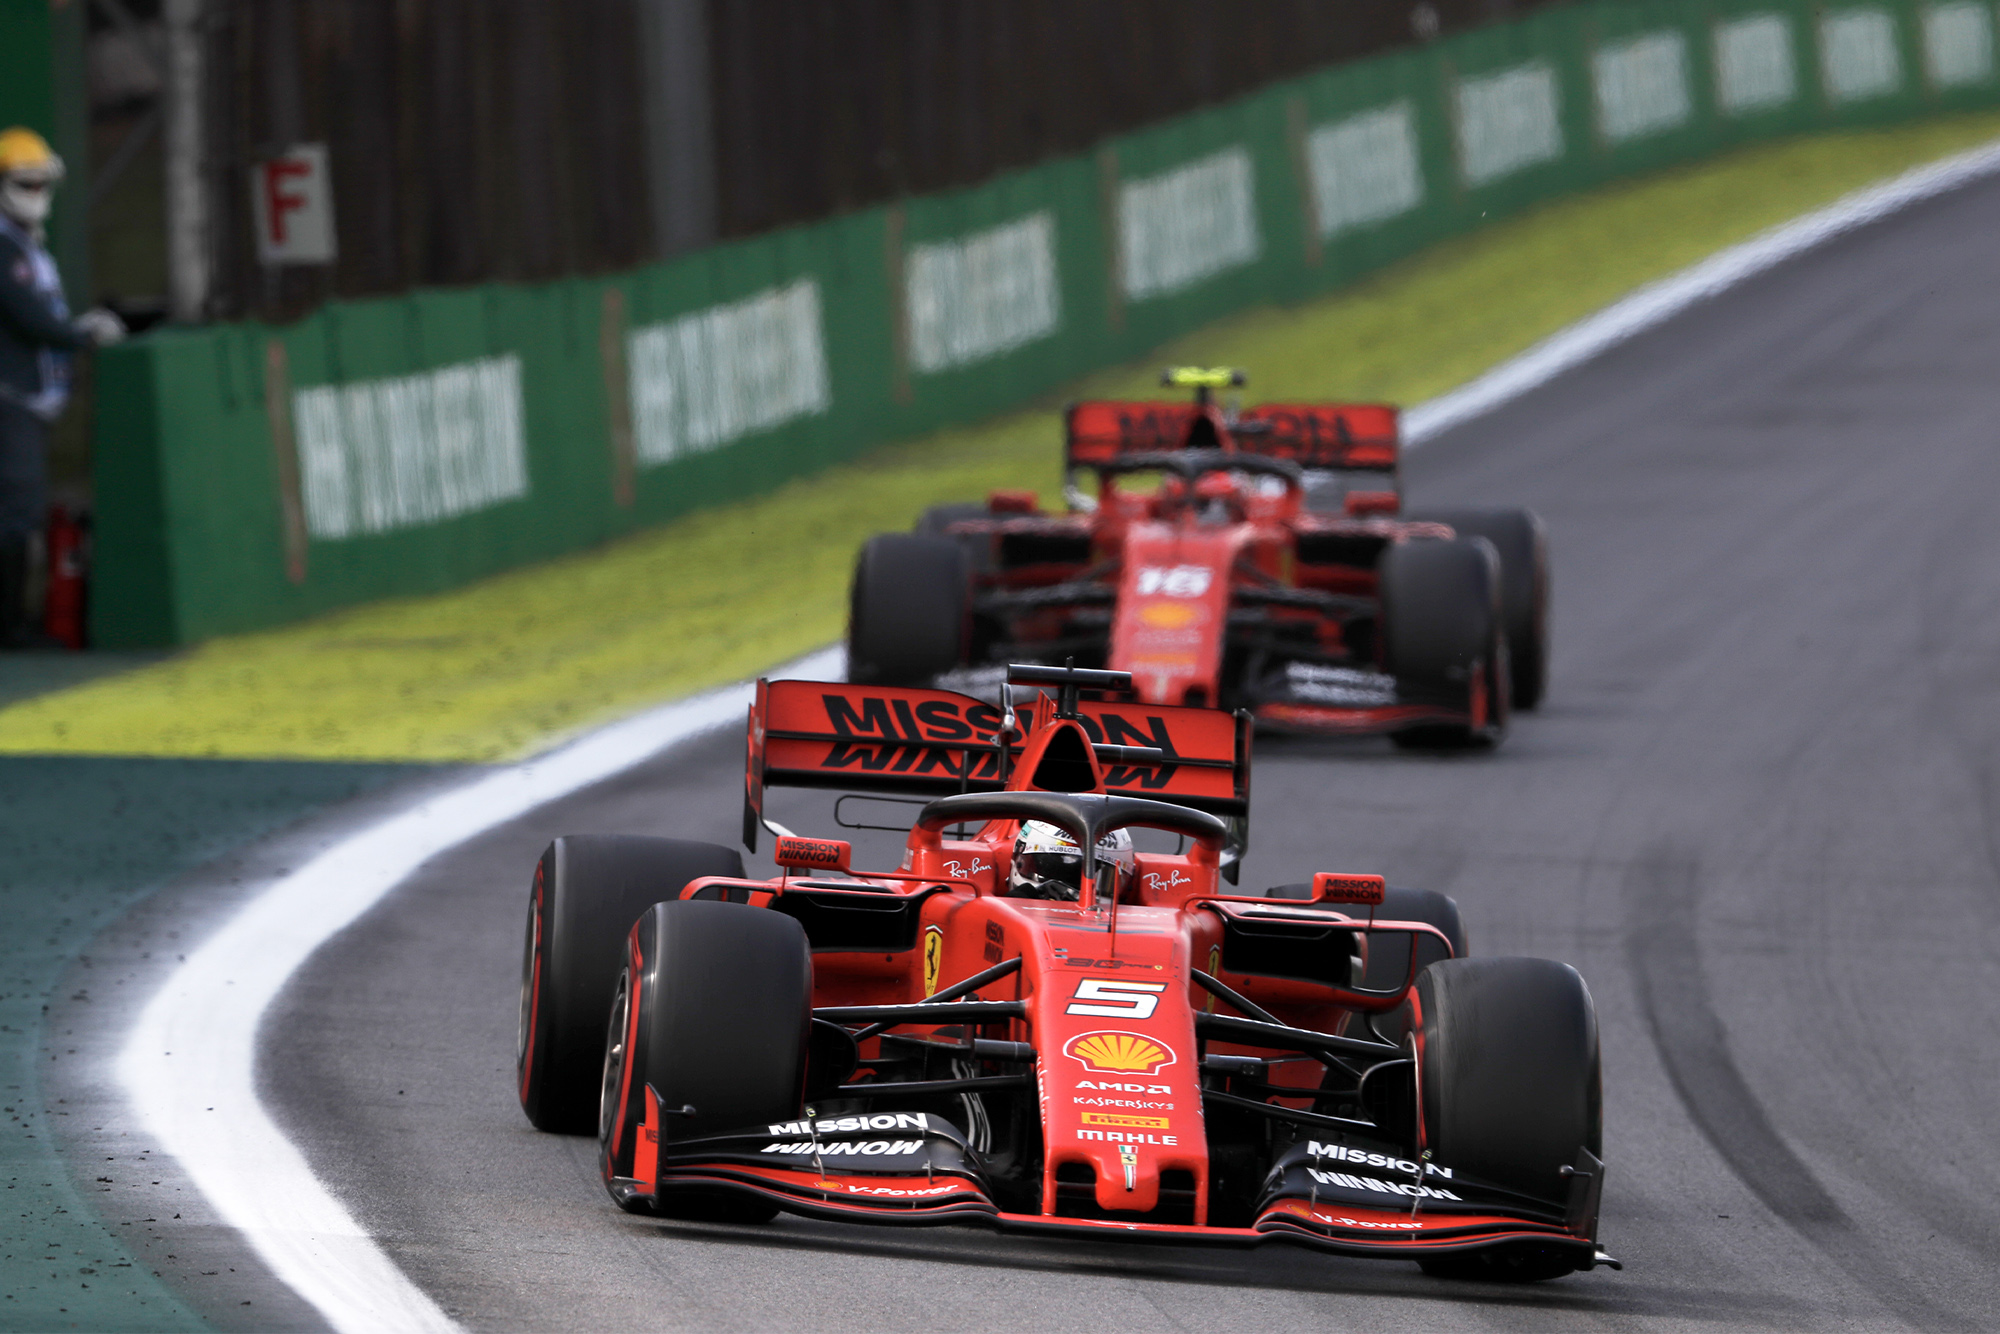 Sebastian Vettel is shadowed by Charles Leclerc during the 2019 Brazilian Grand Prix